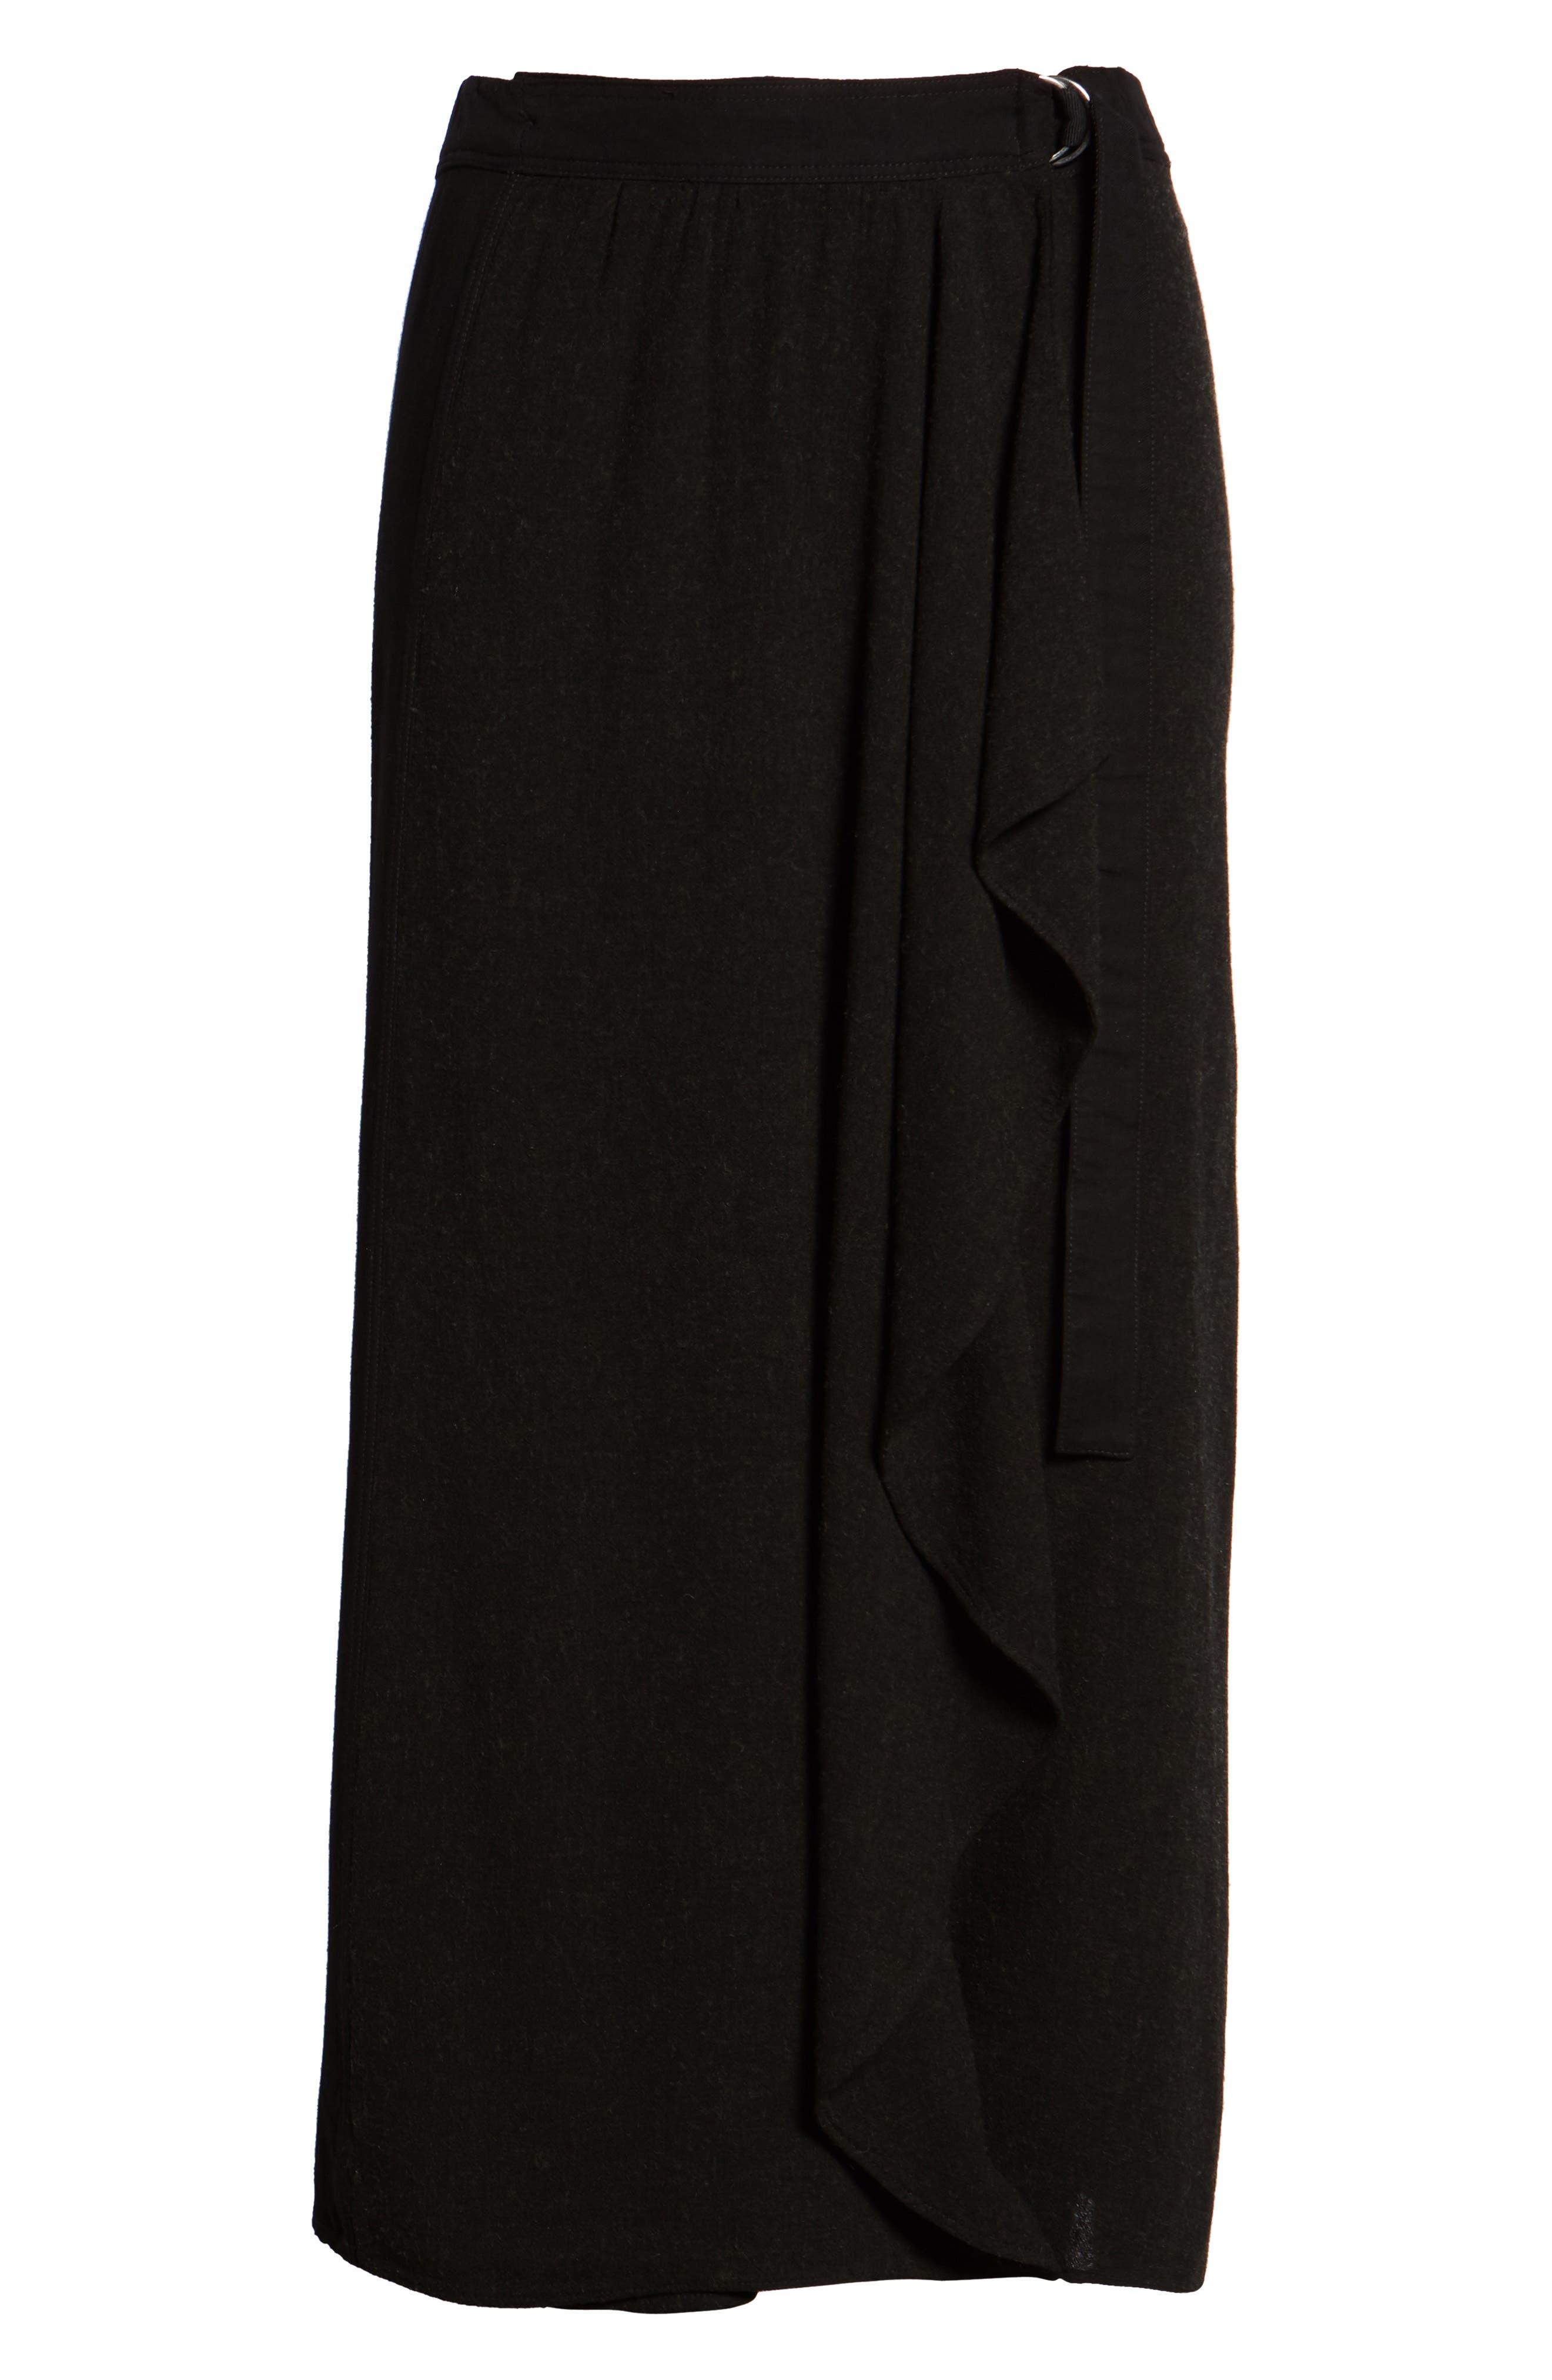 Midi Skirt,                             Alternate thumbnail 6, color,                             001